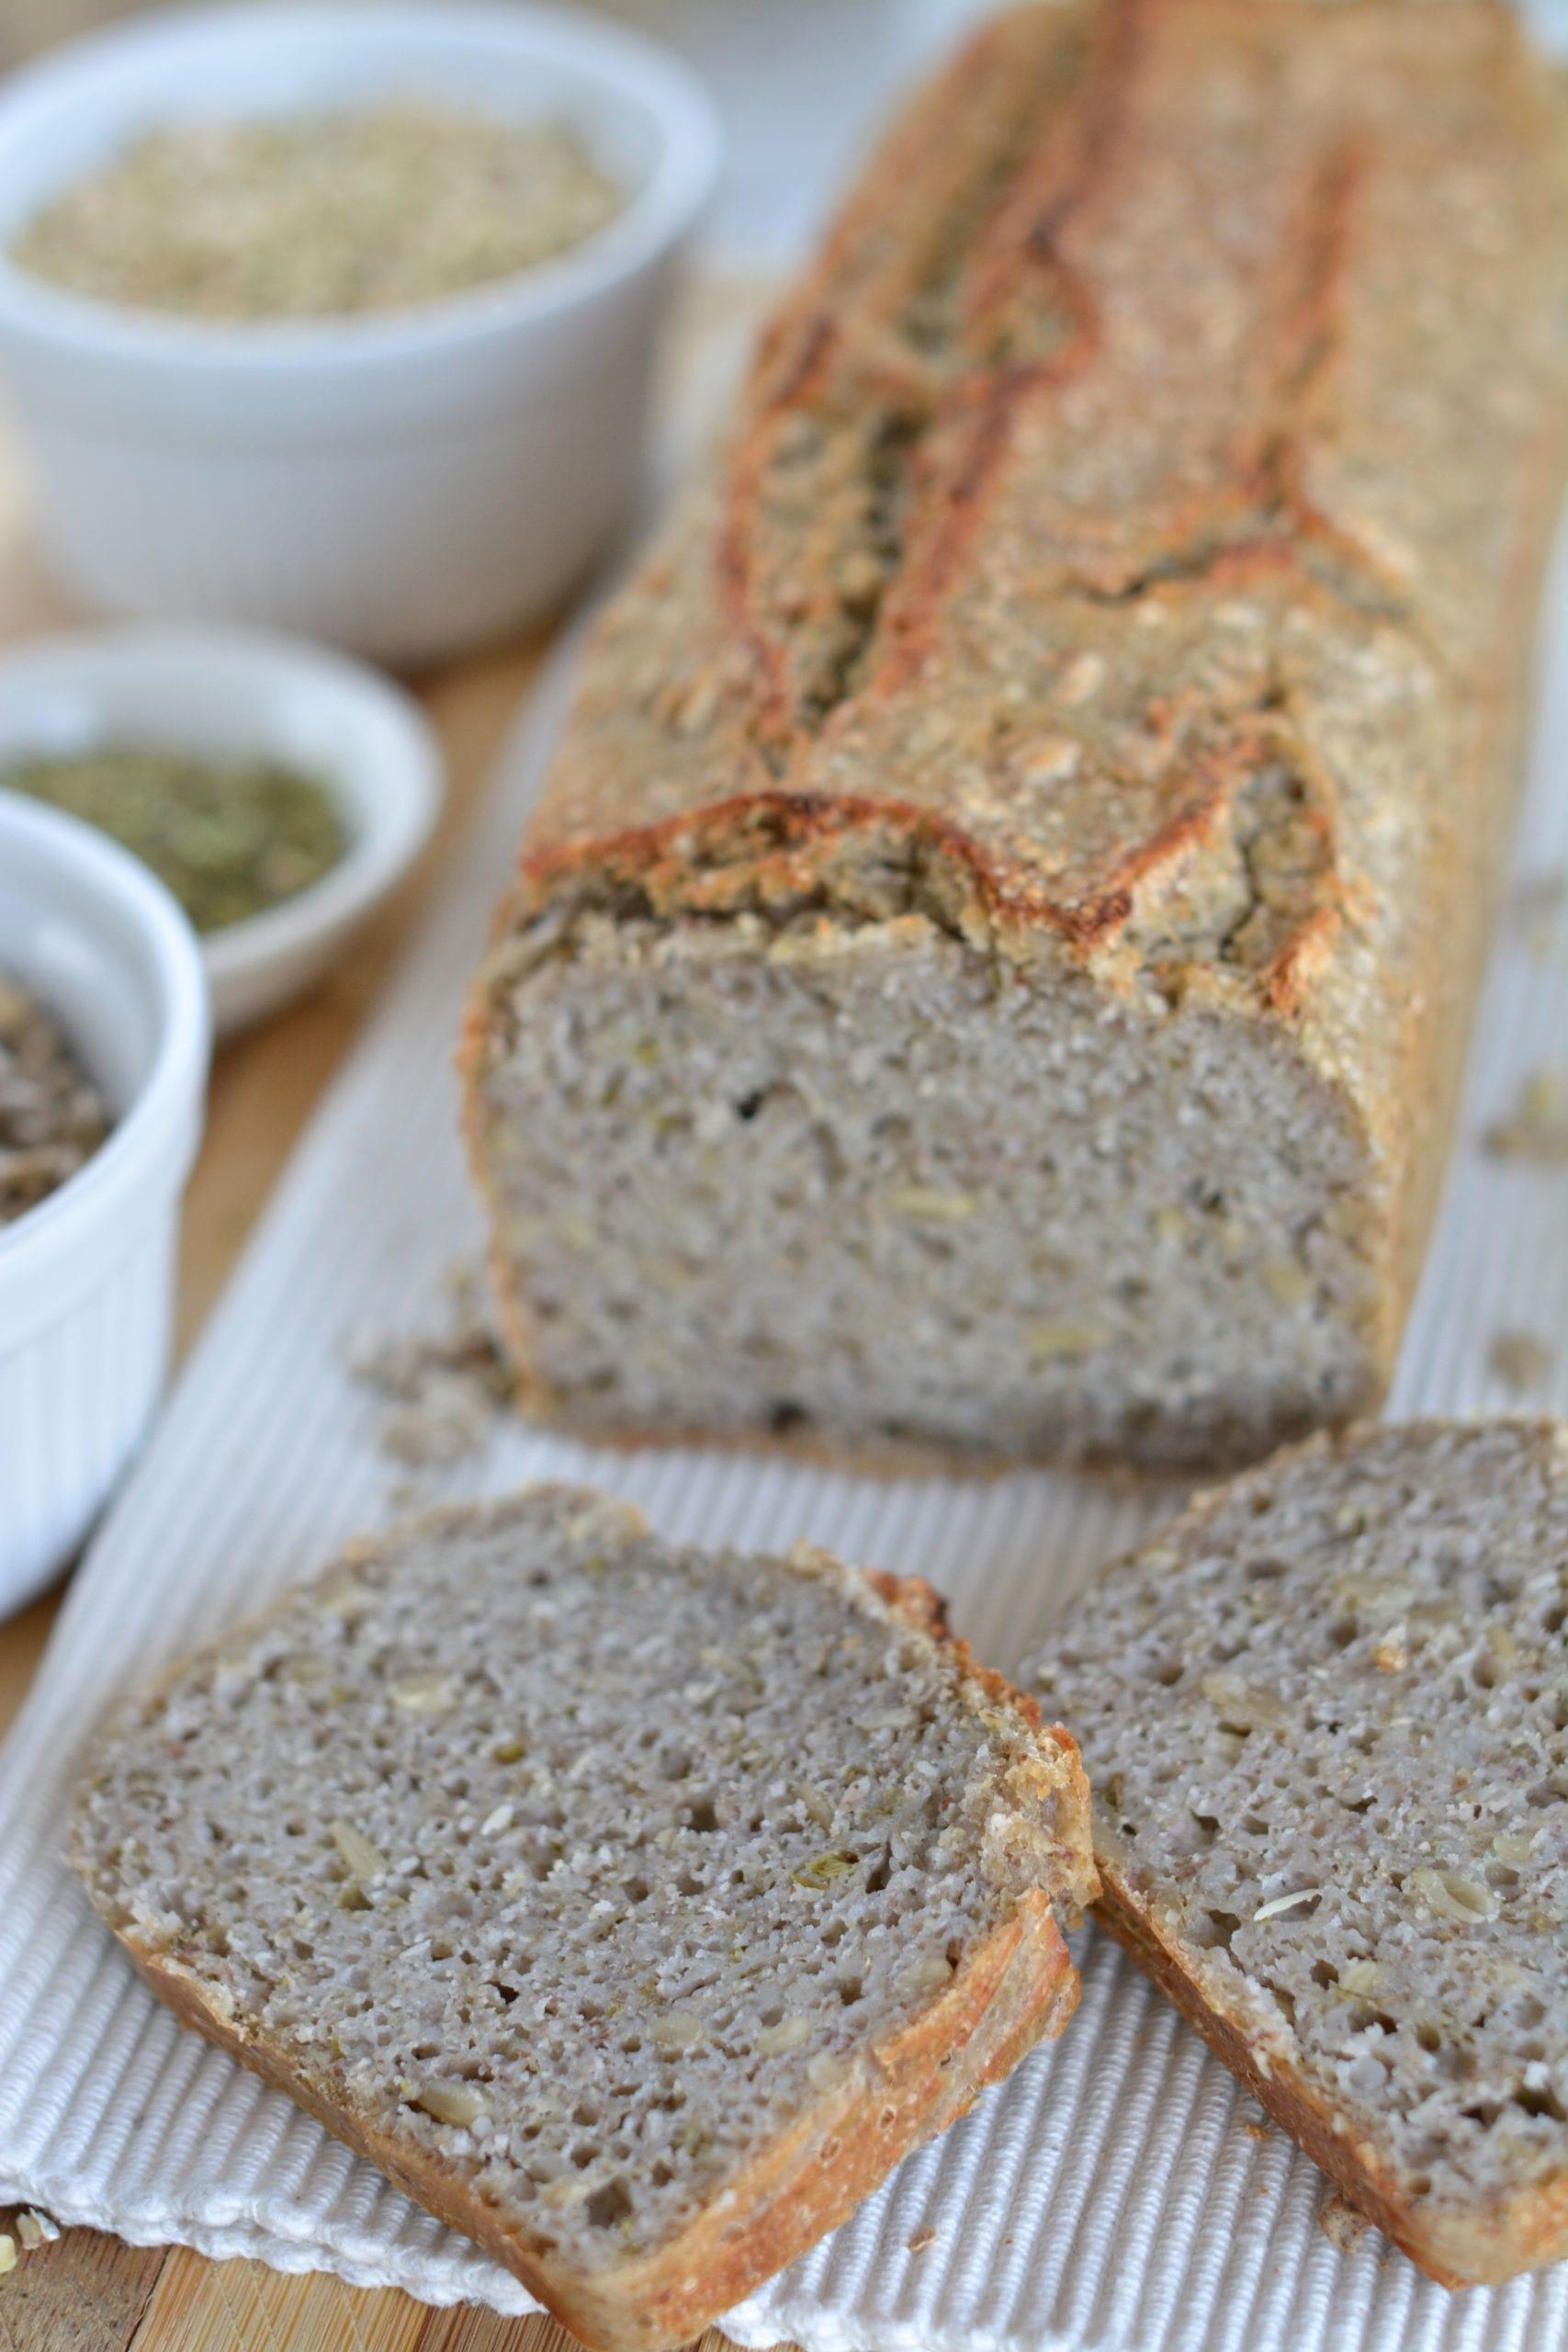 Fermented Buckwheat Bread With Hemp Seed Spread